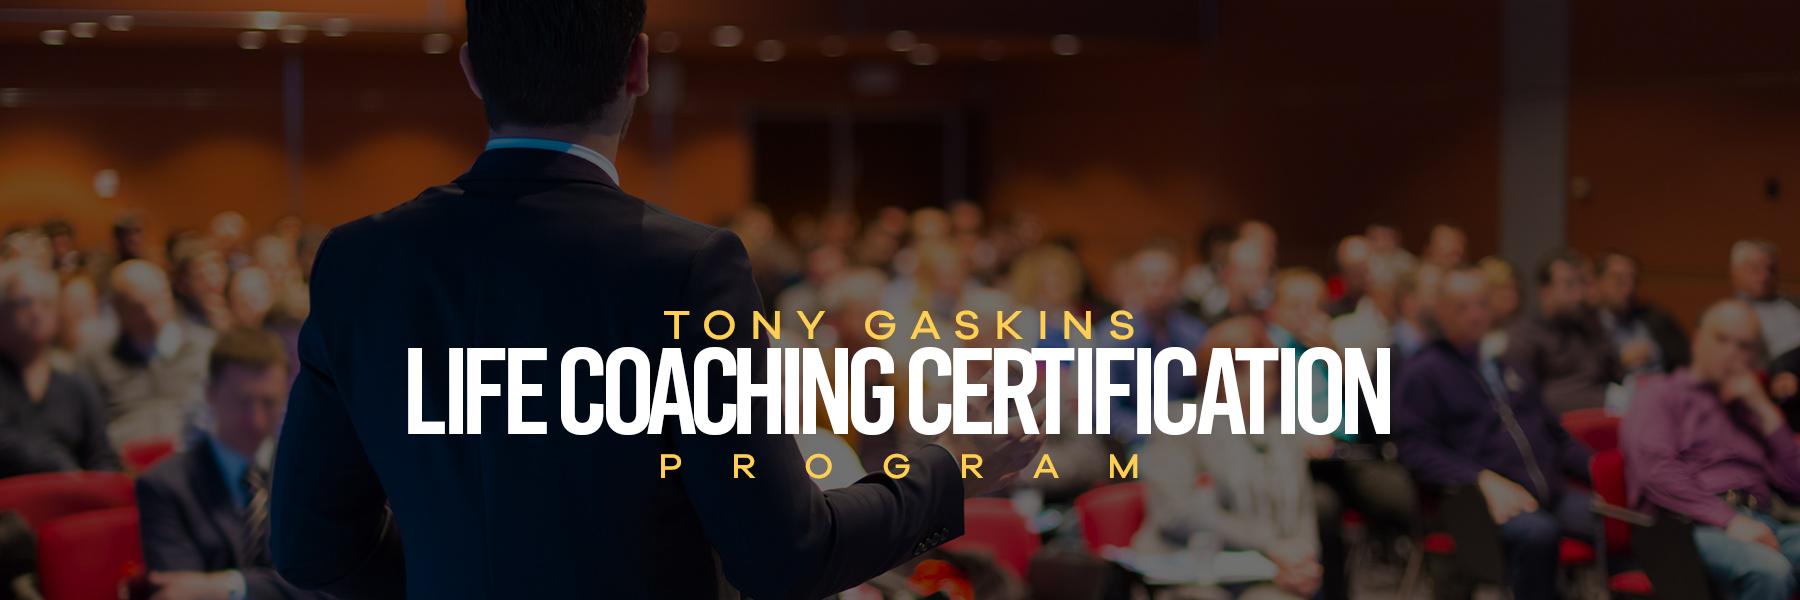 Life Coaching Certification Program Motivational Speaker